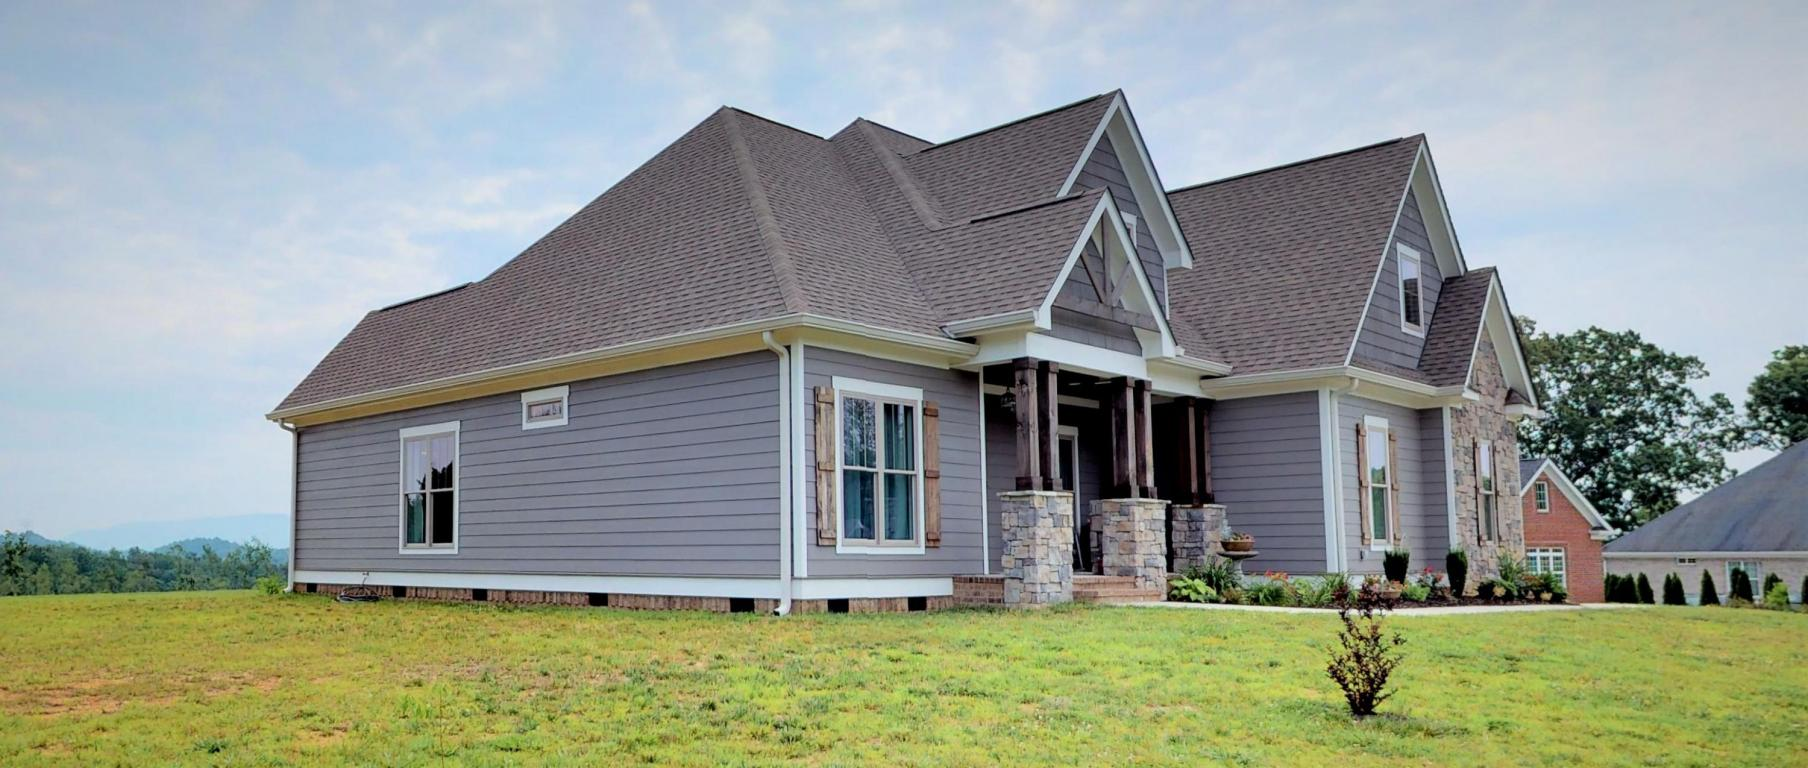 406 Ne Keystone Dr, Cleveland, TN 37312